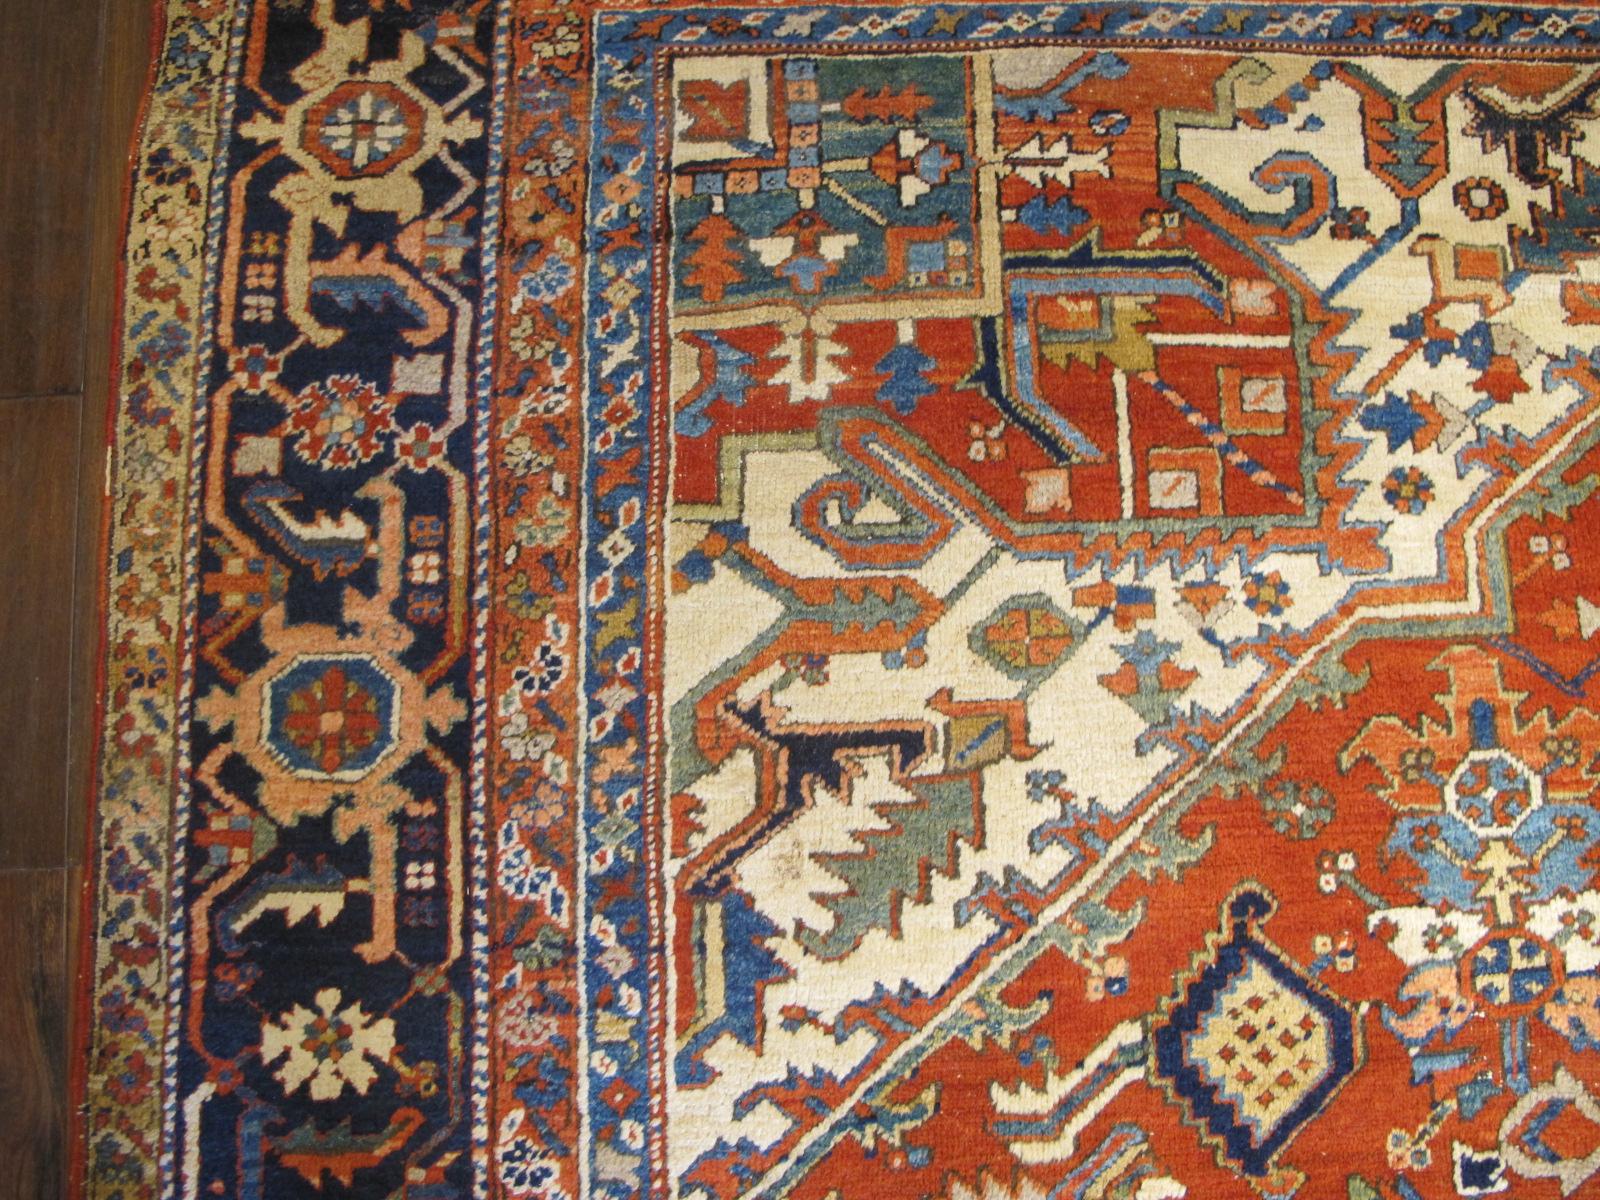 23680 Persian Heriz rug 10 x 13 (4)